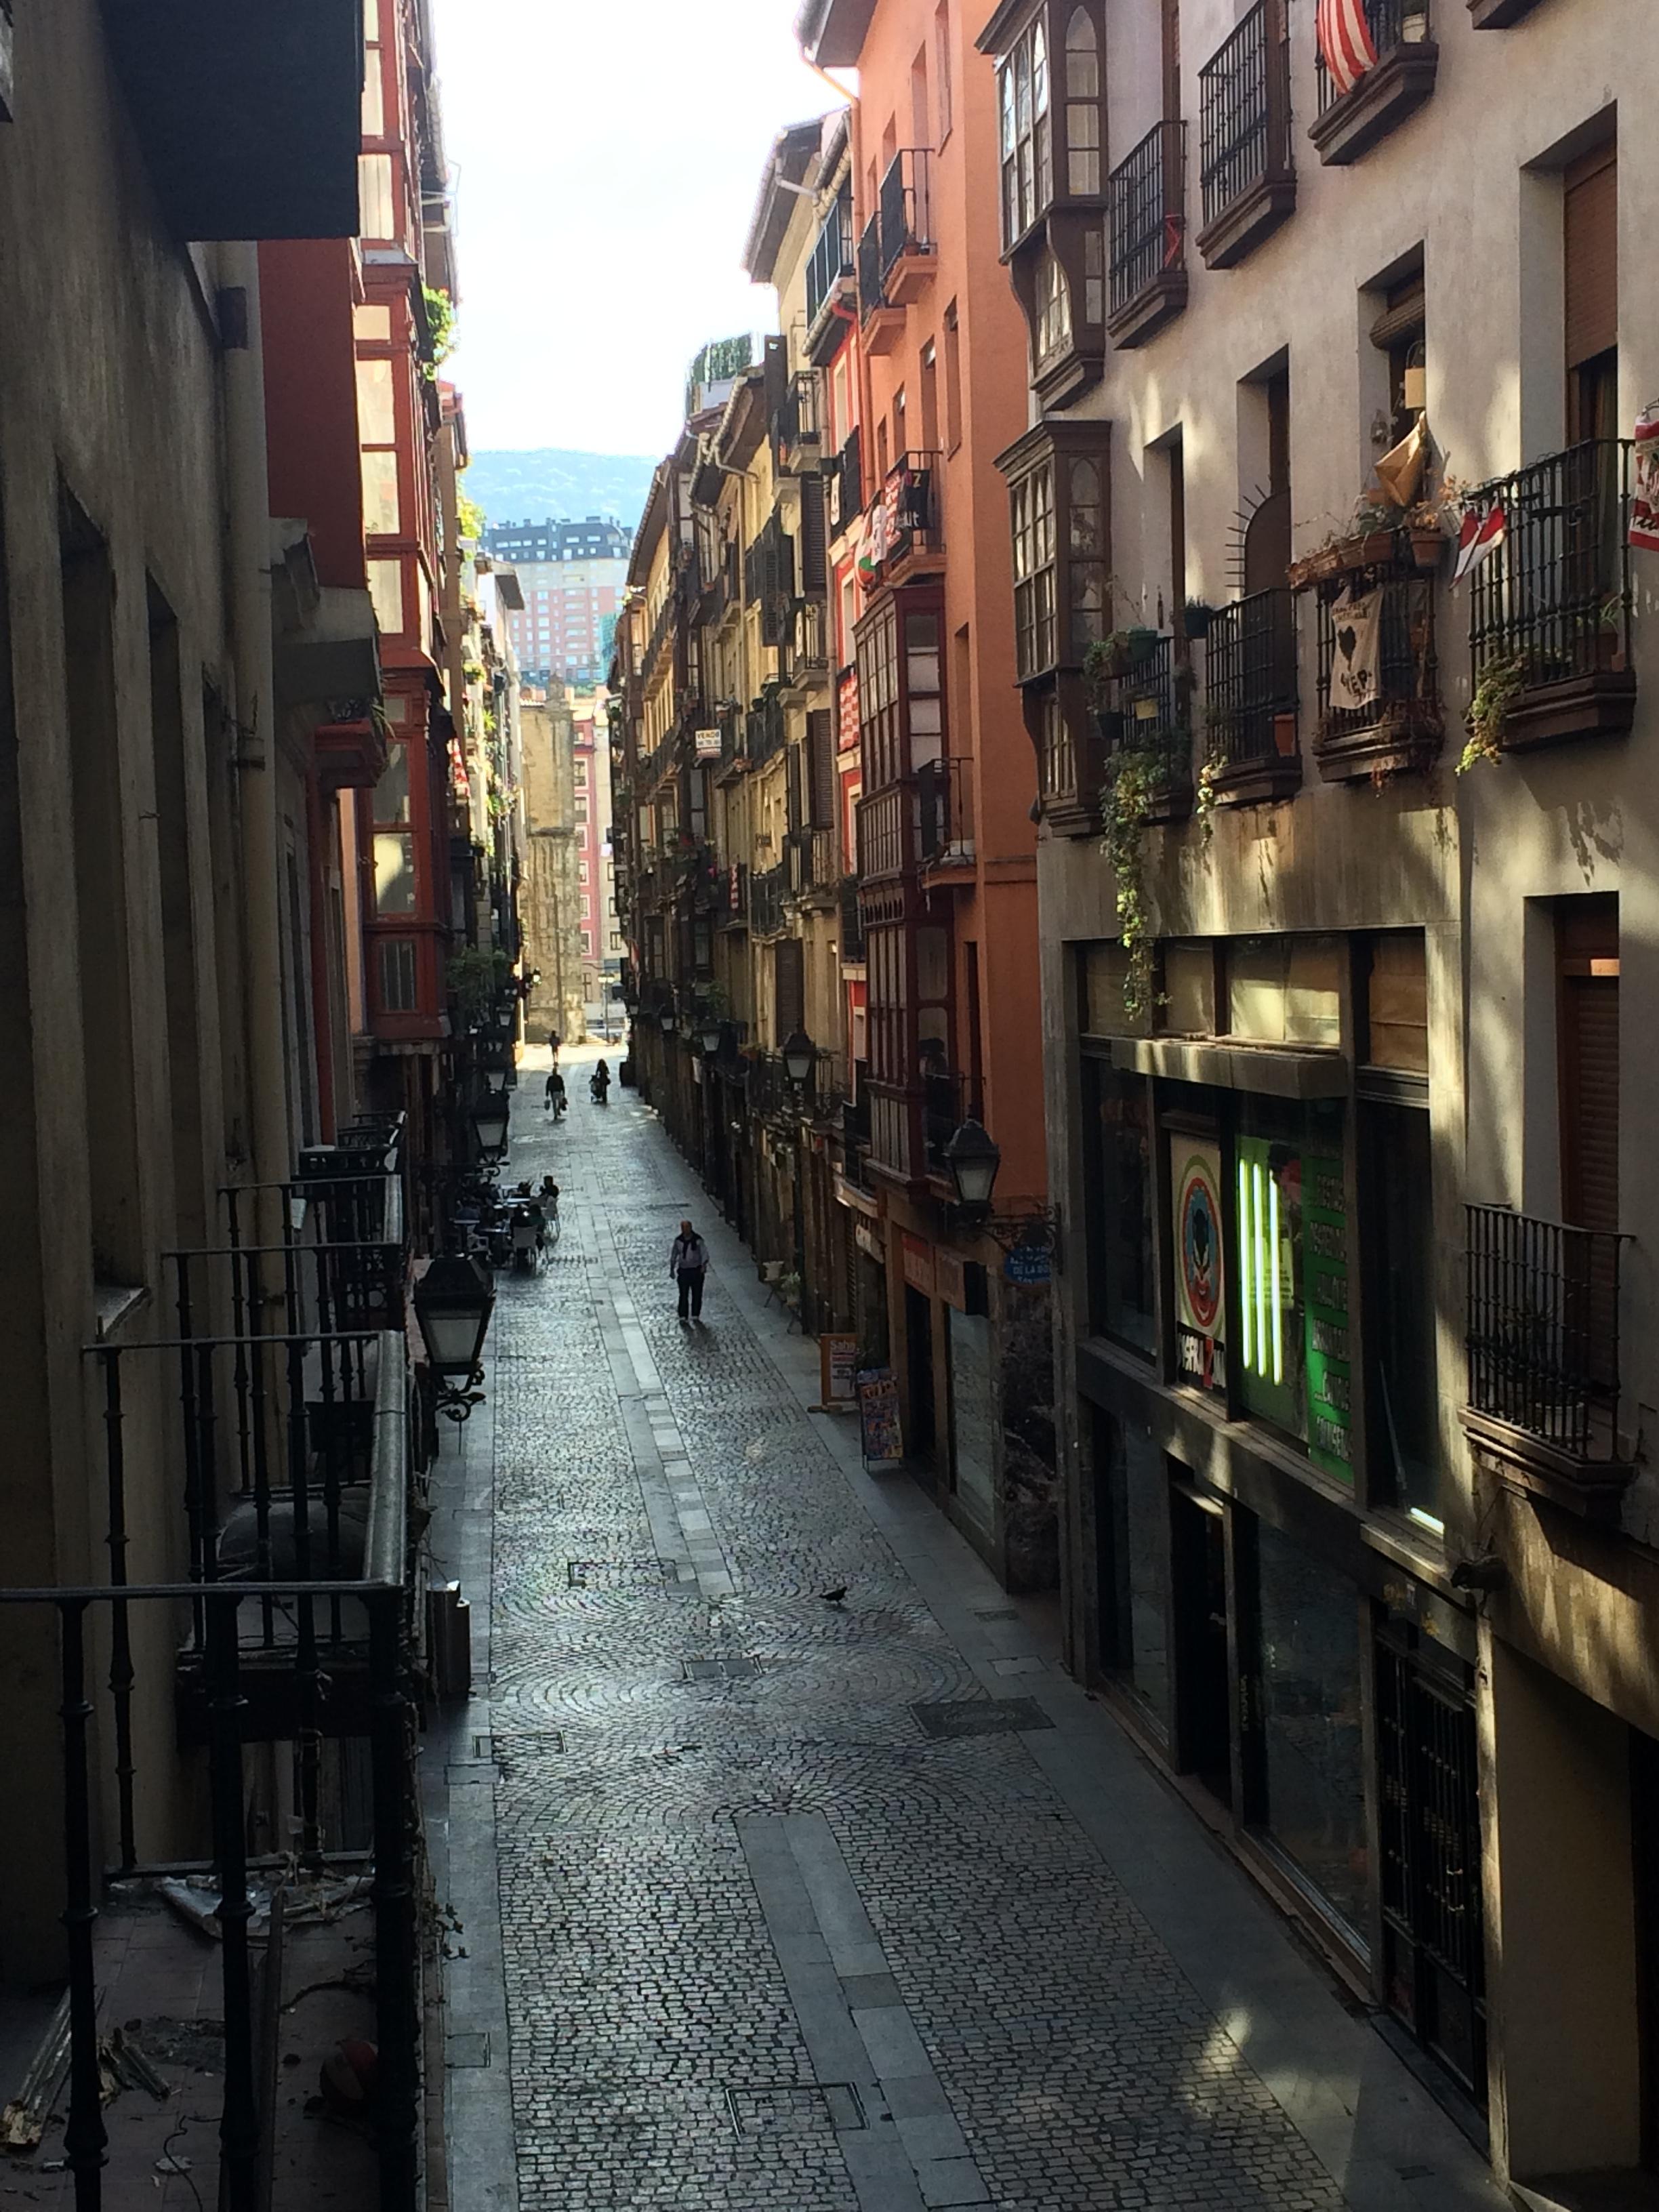 Good morning, Bilbao!